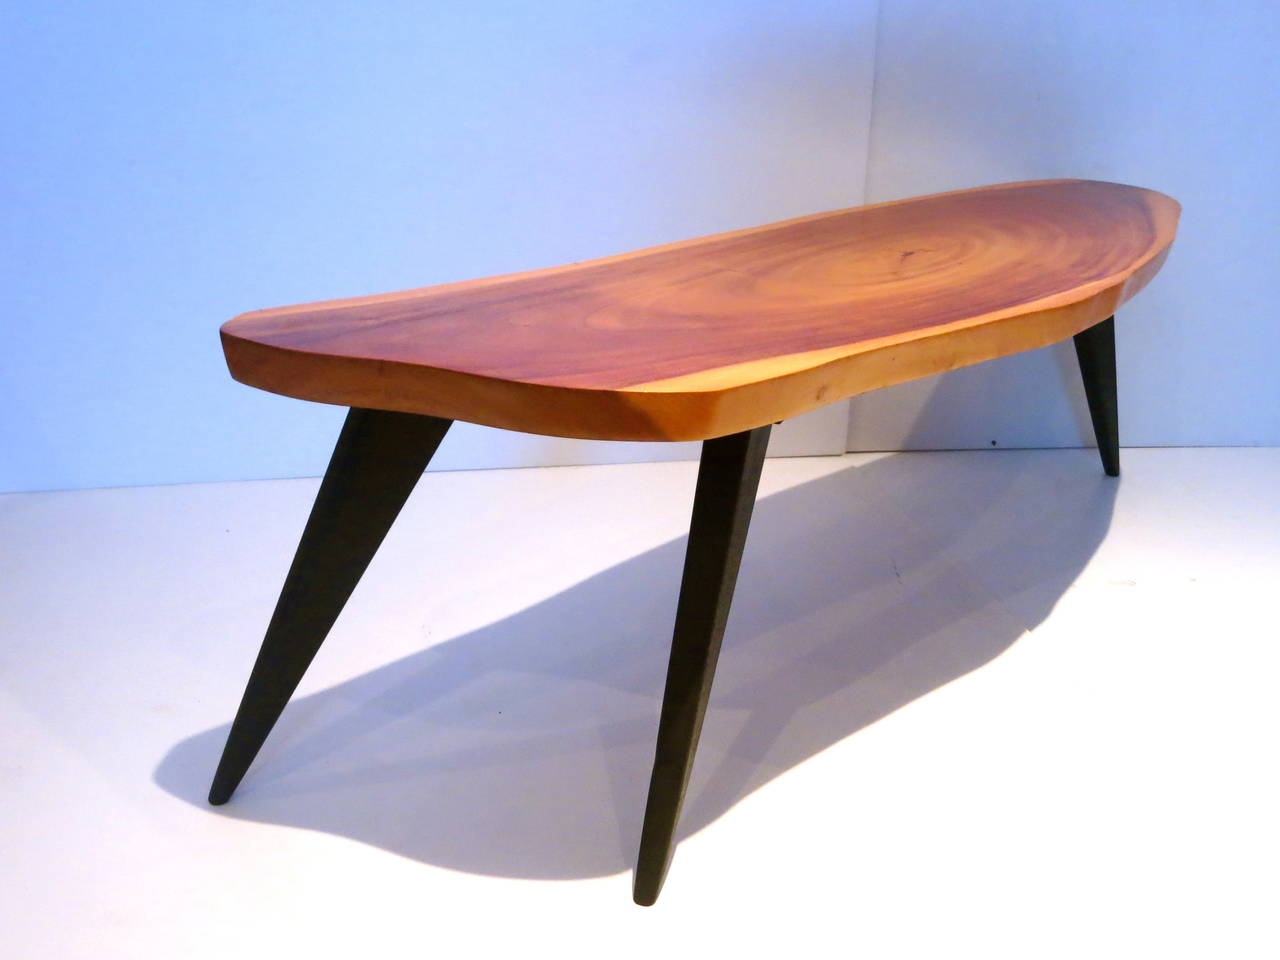 Breathtaking Tropical Coffee Table Photos Design Ideas Dievoon